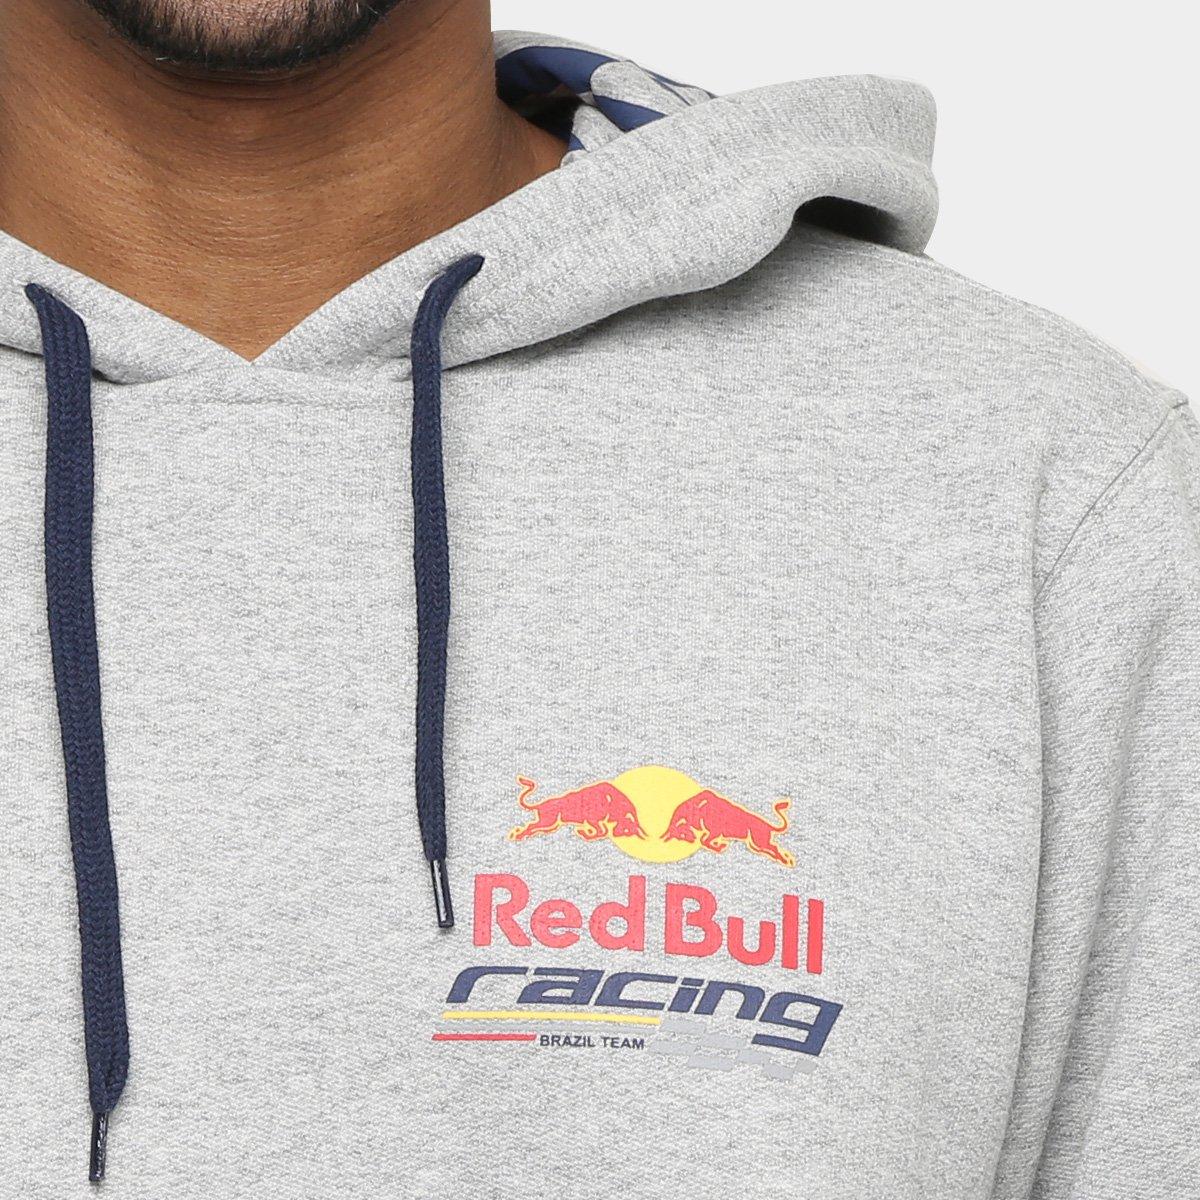 Moletom Red Bull Racing Stock Car Logo Pequeno Masculino - Compre ... cc4a057730a